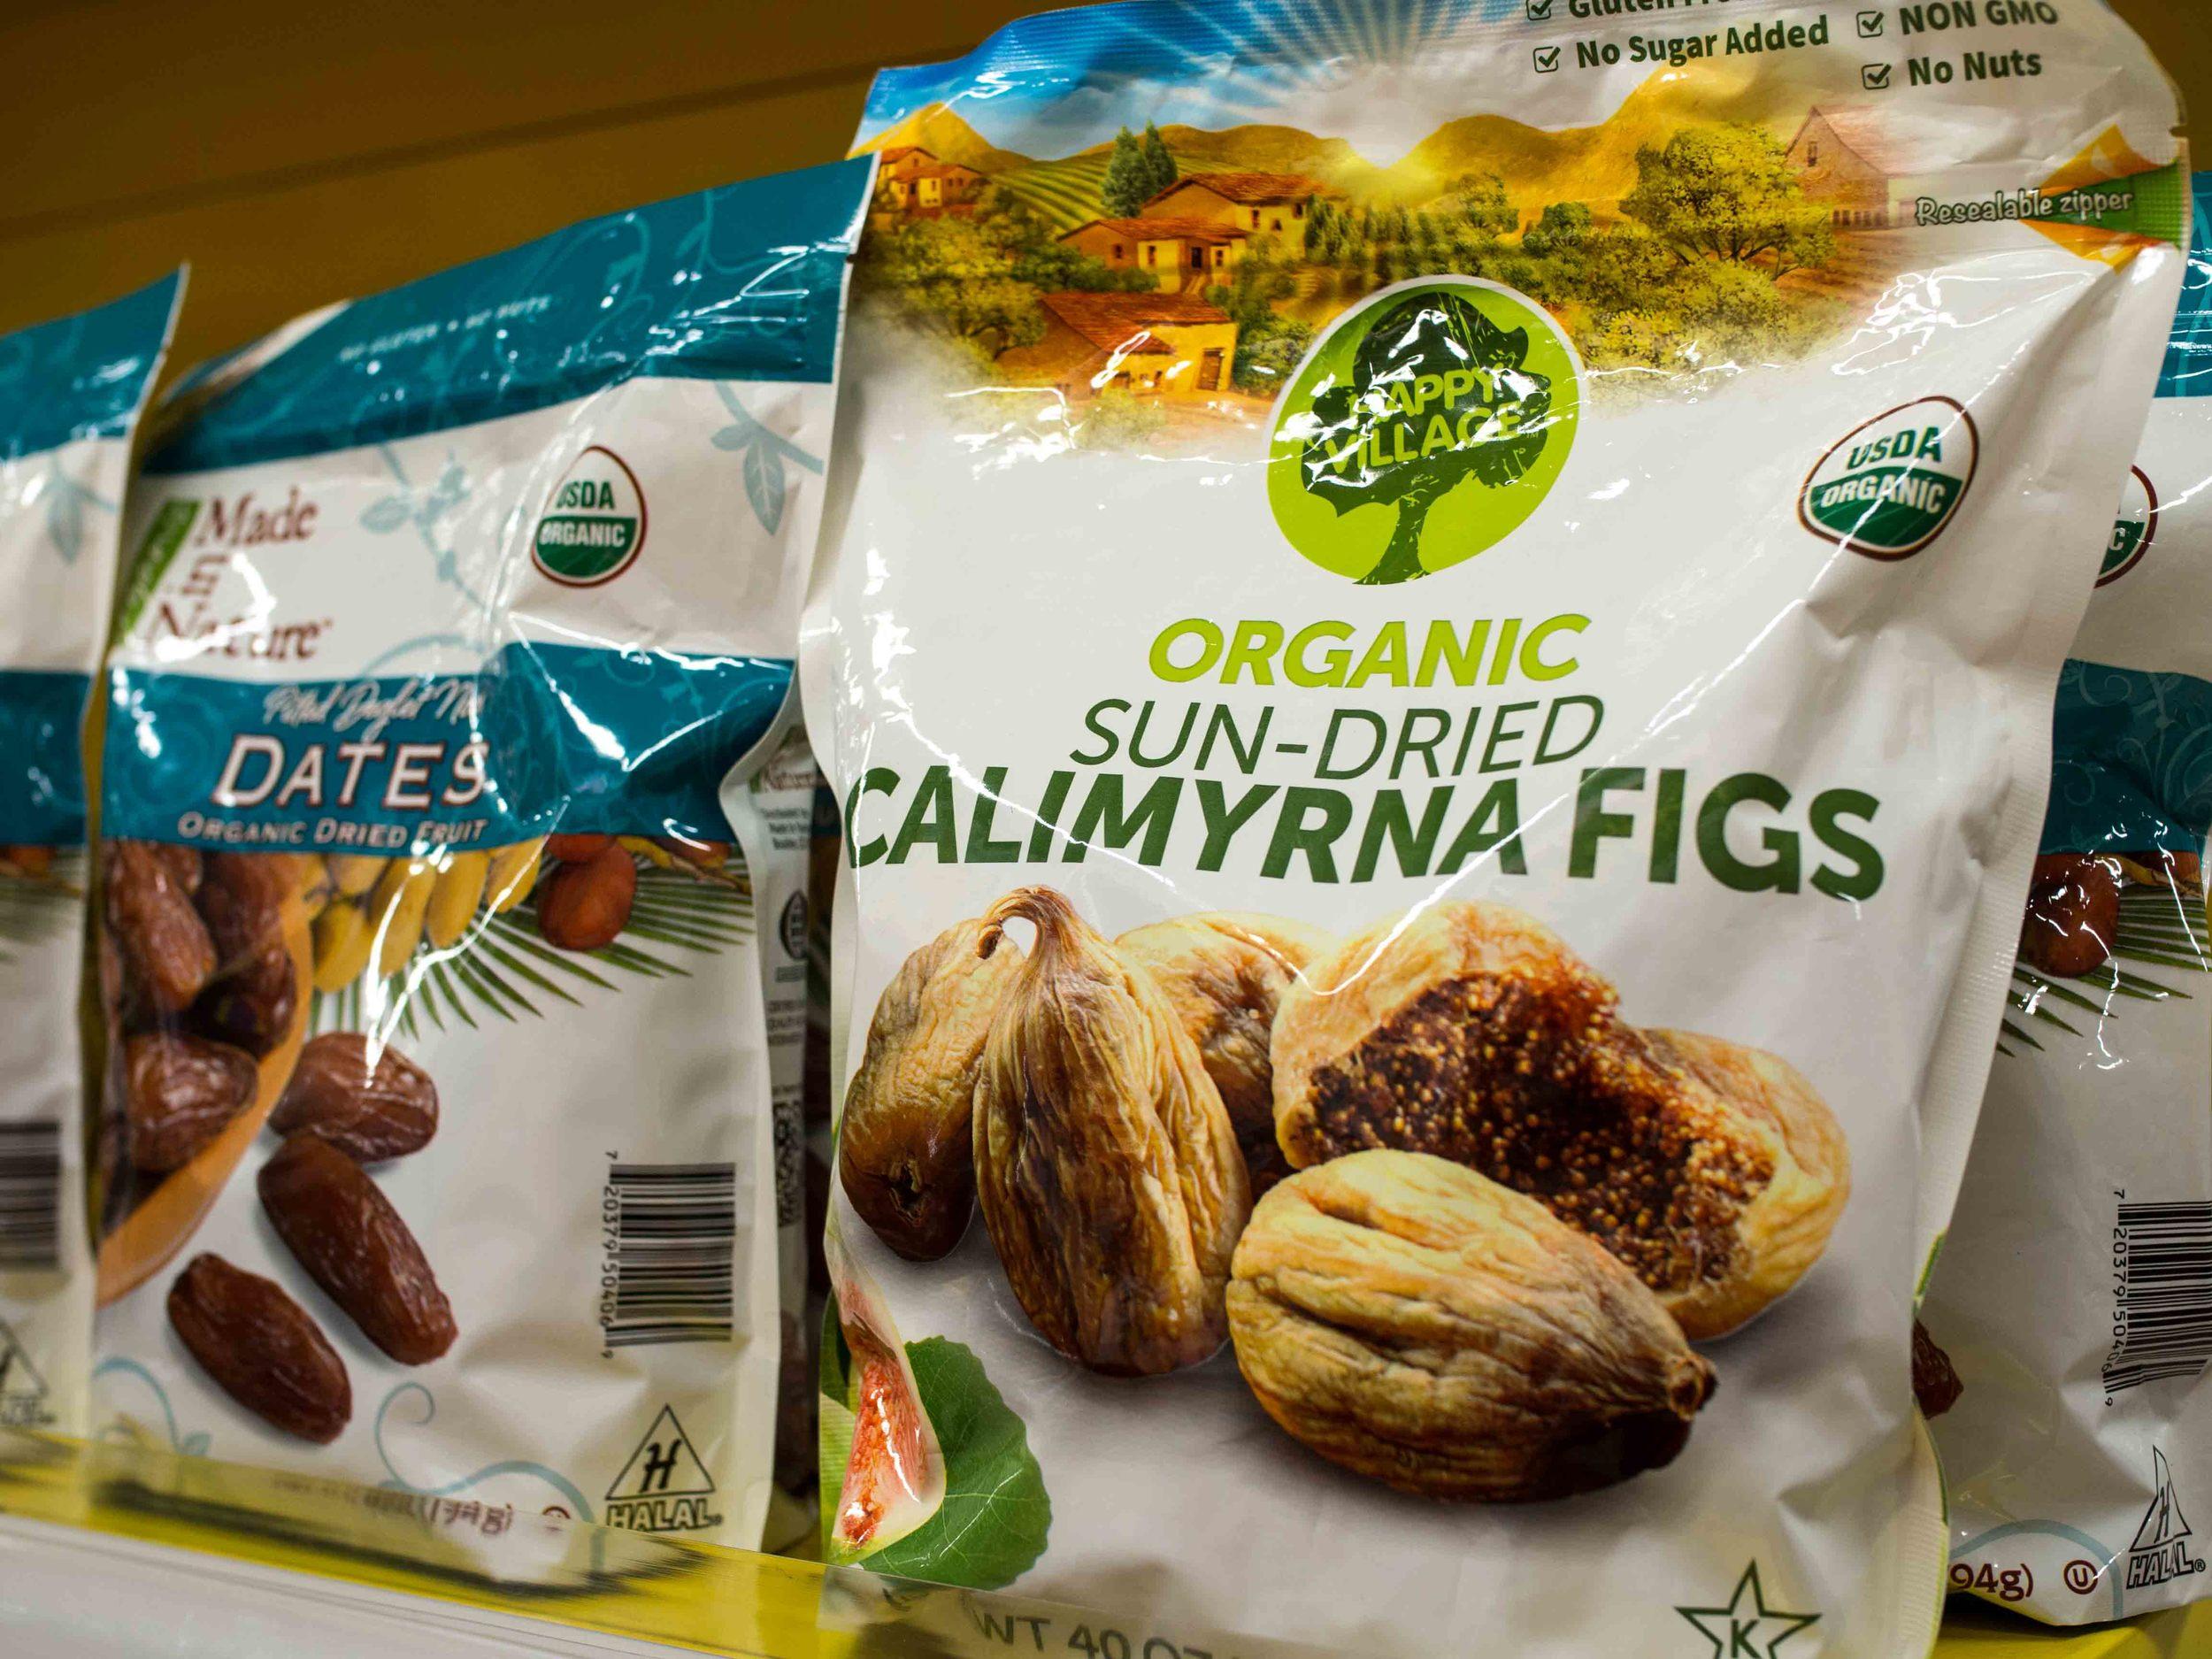 Organic Sun-Dried Calimyrna Figs